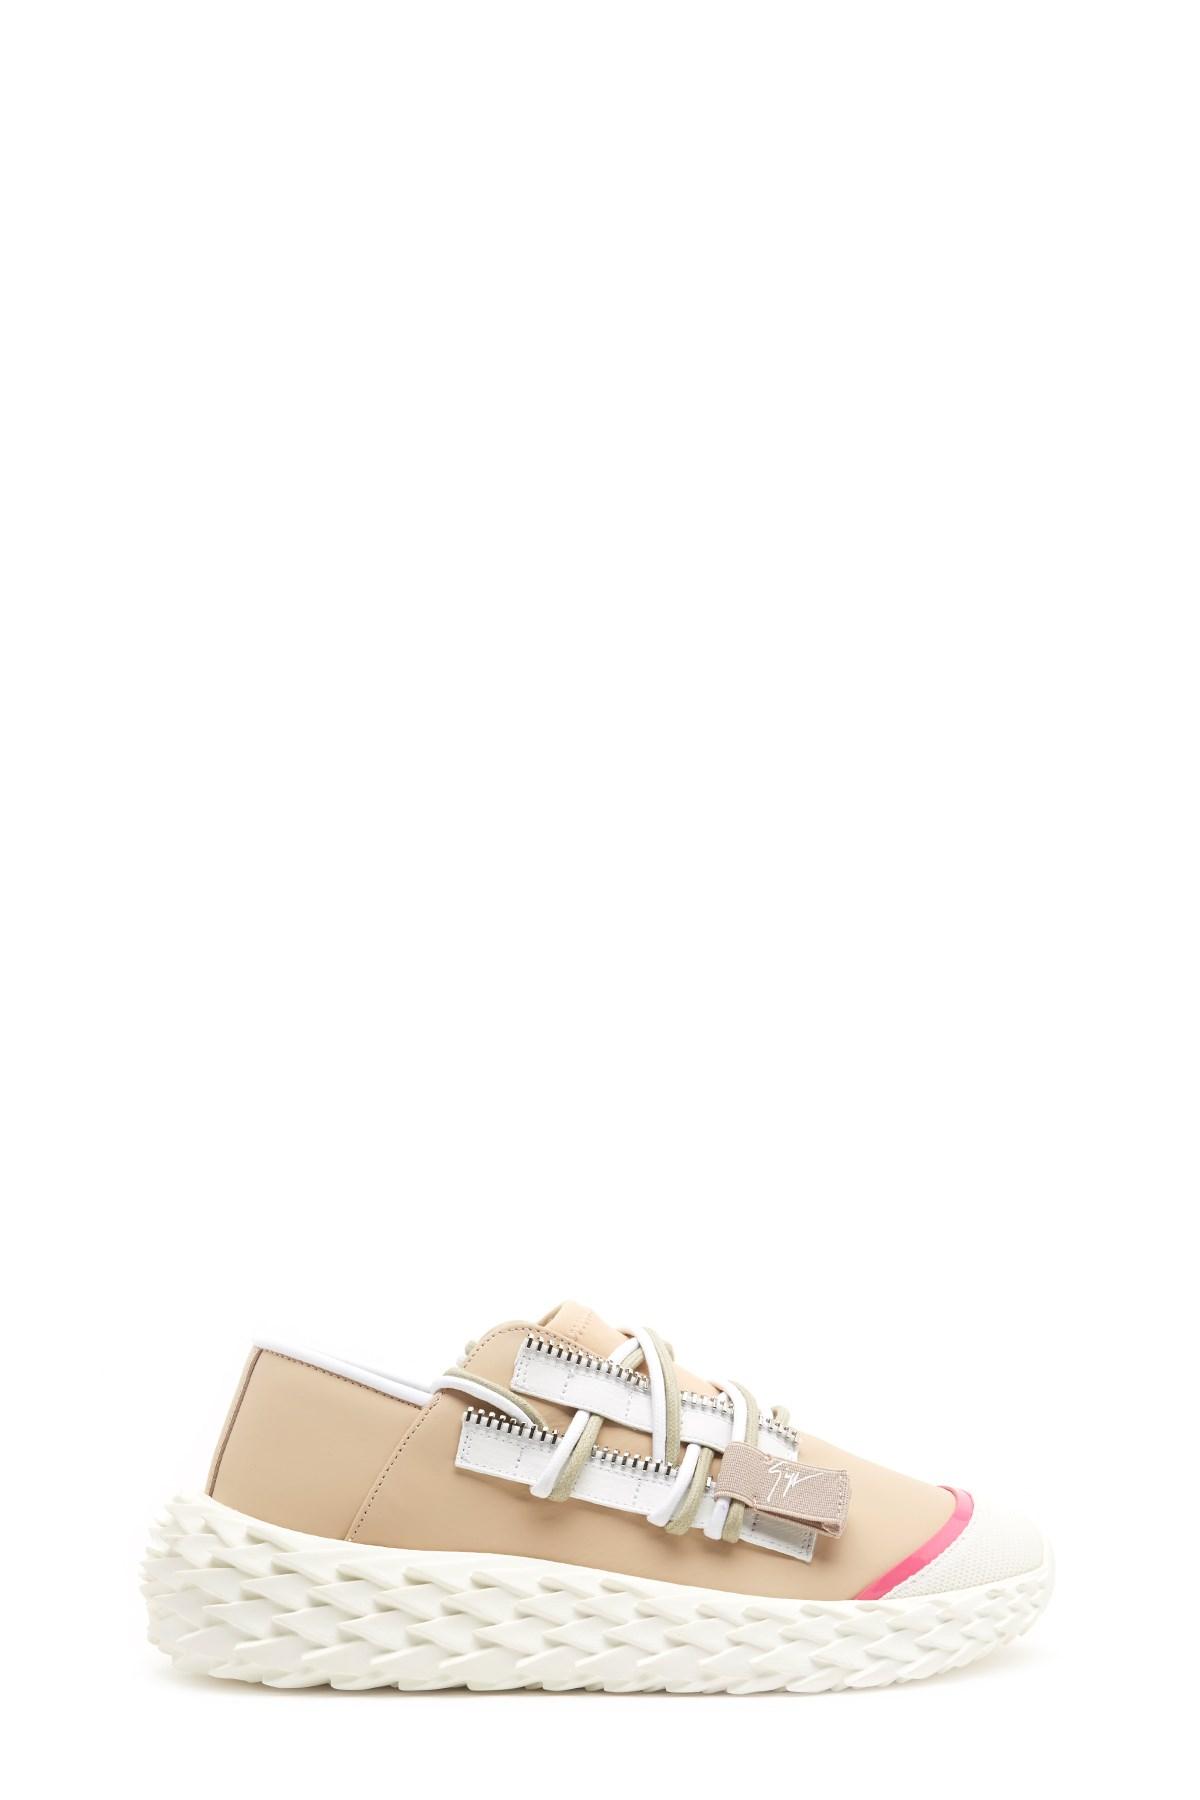 b60ab805f2ef6 giuseppe zanotti 'Urchin' Sneakers available on julian-fashion.com ...